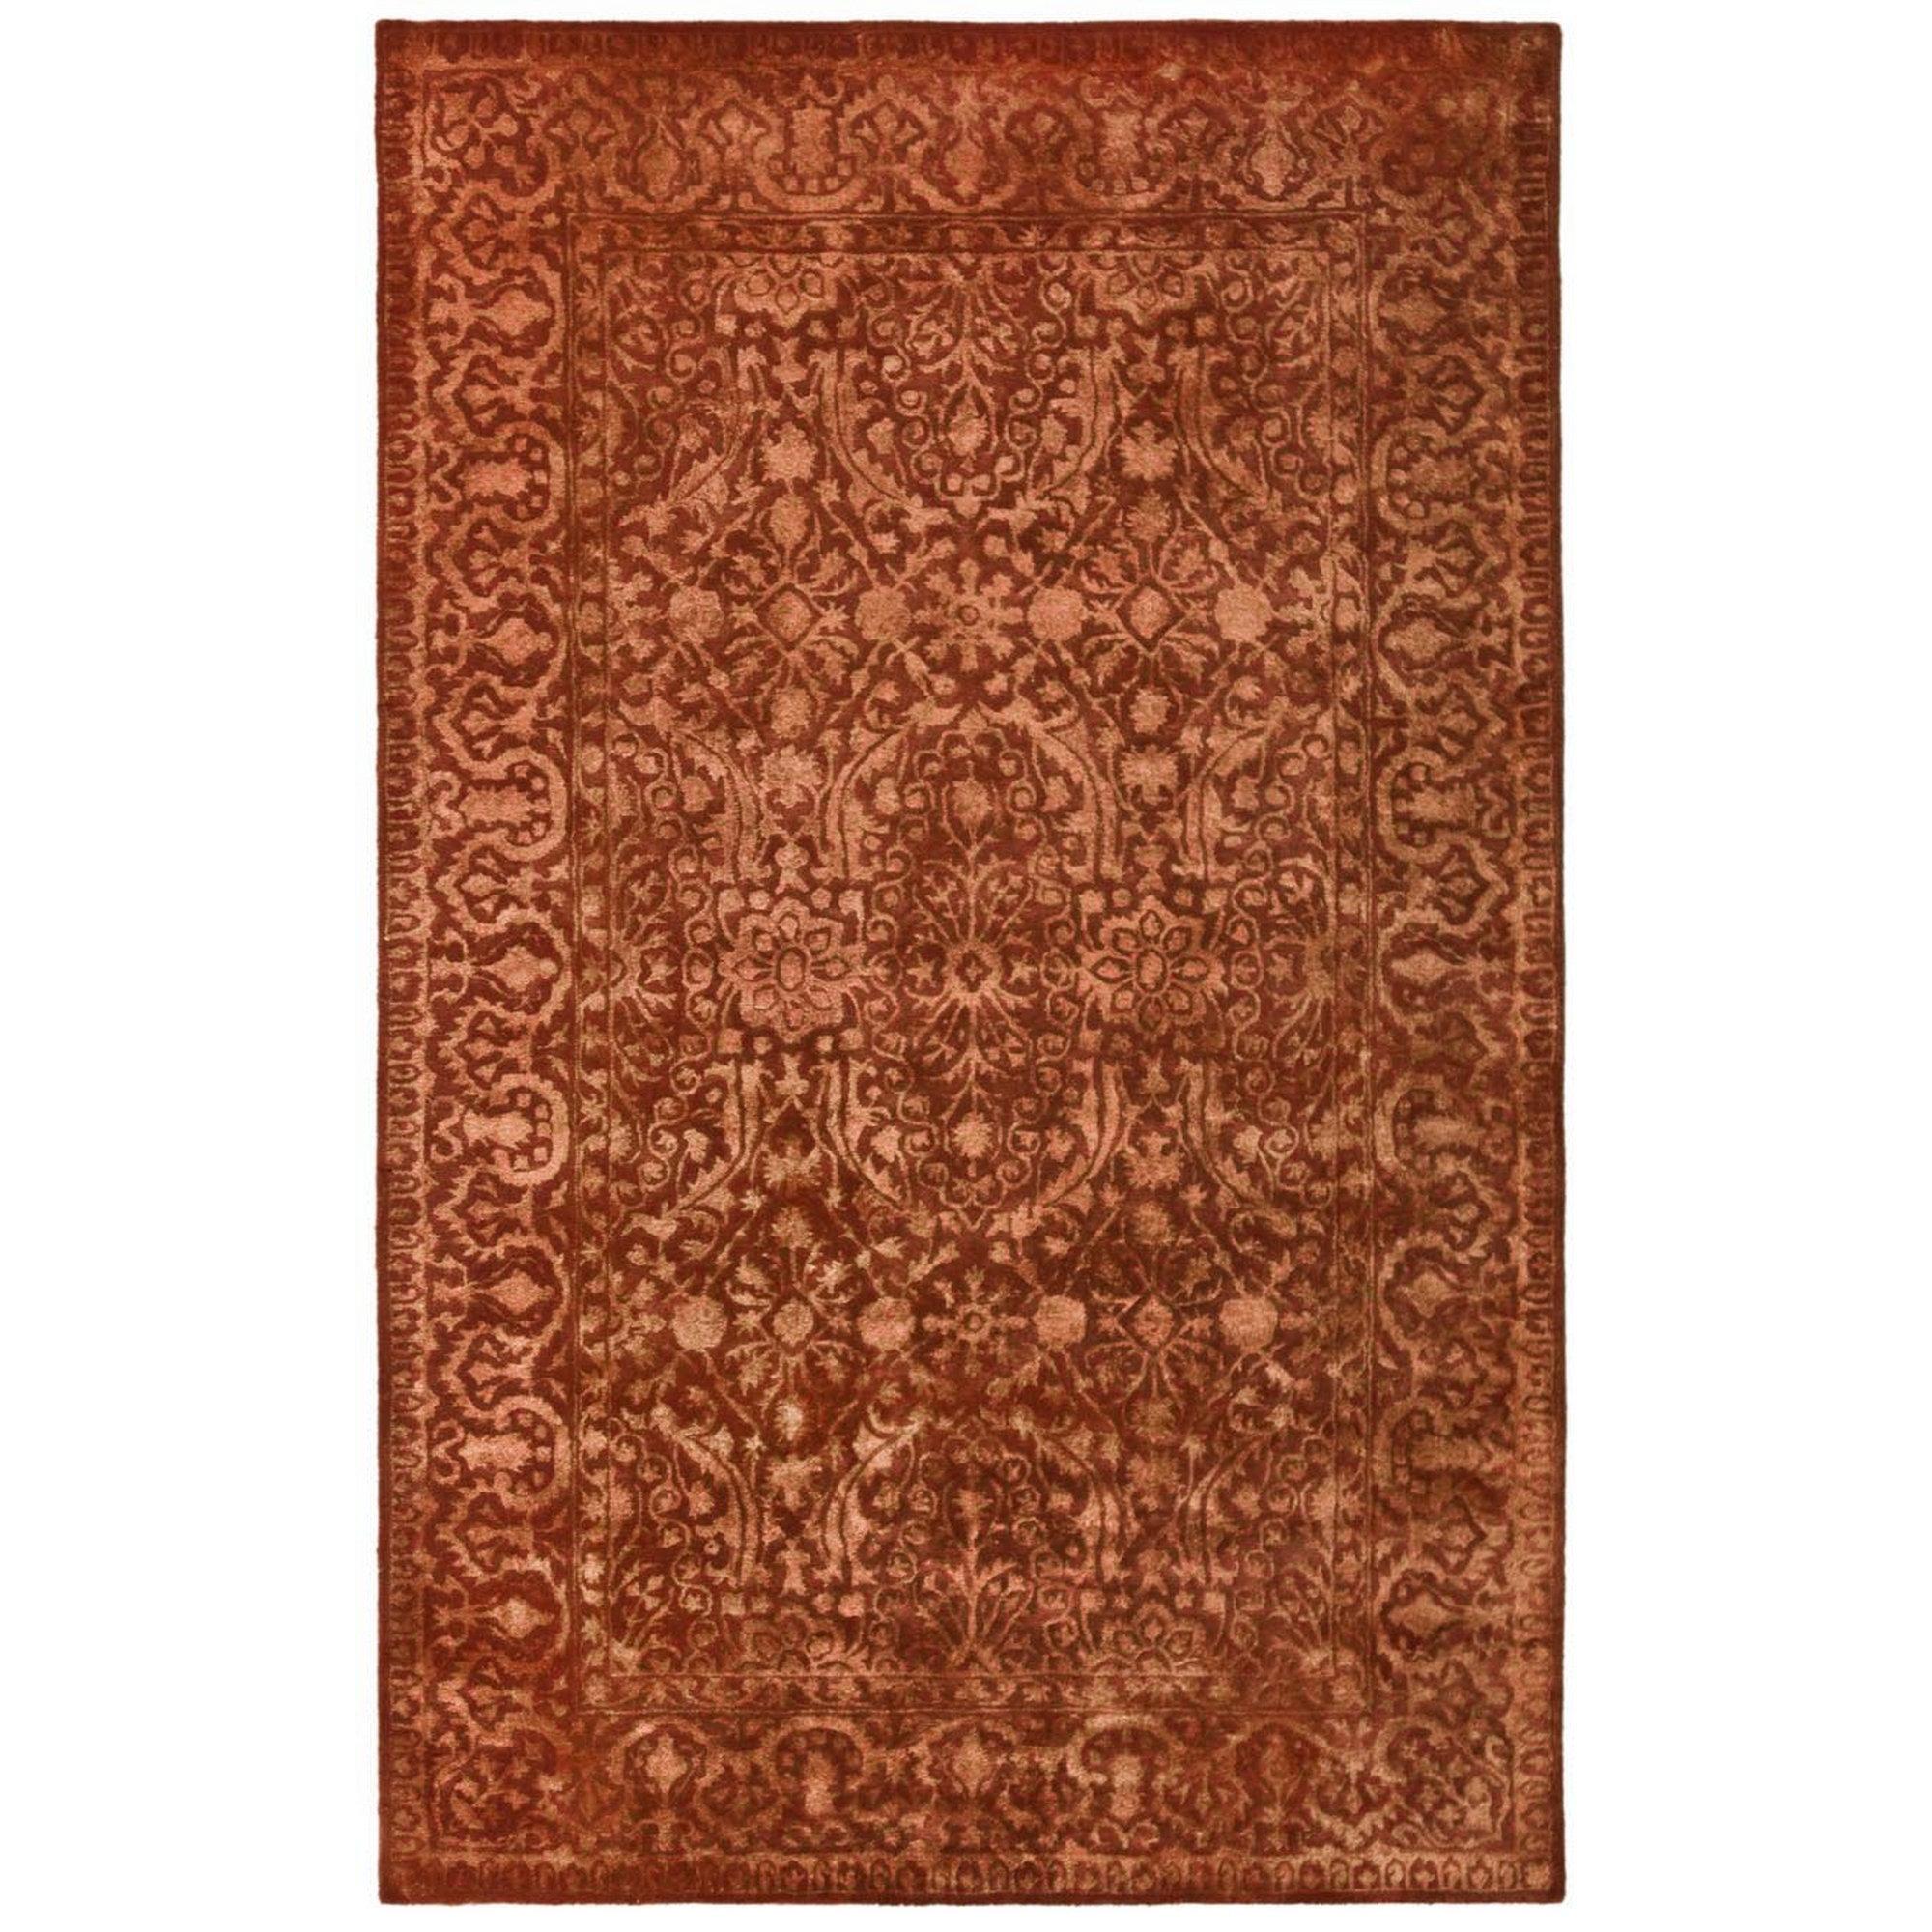 Safavieh Silk Road Hand Tufted Wool Rust Area Rug Reviews Wayfair